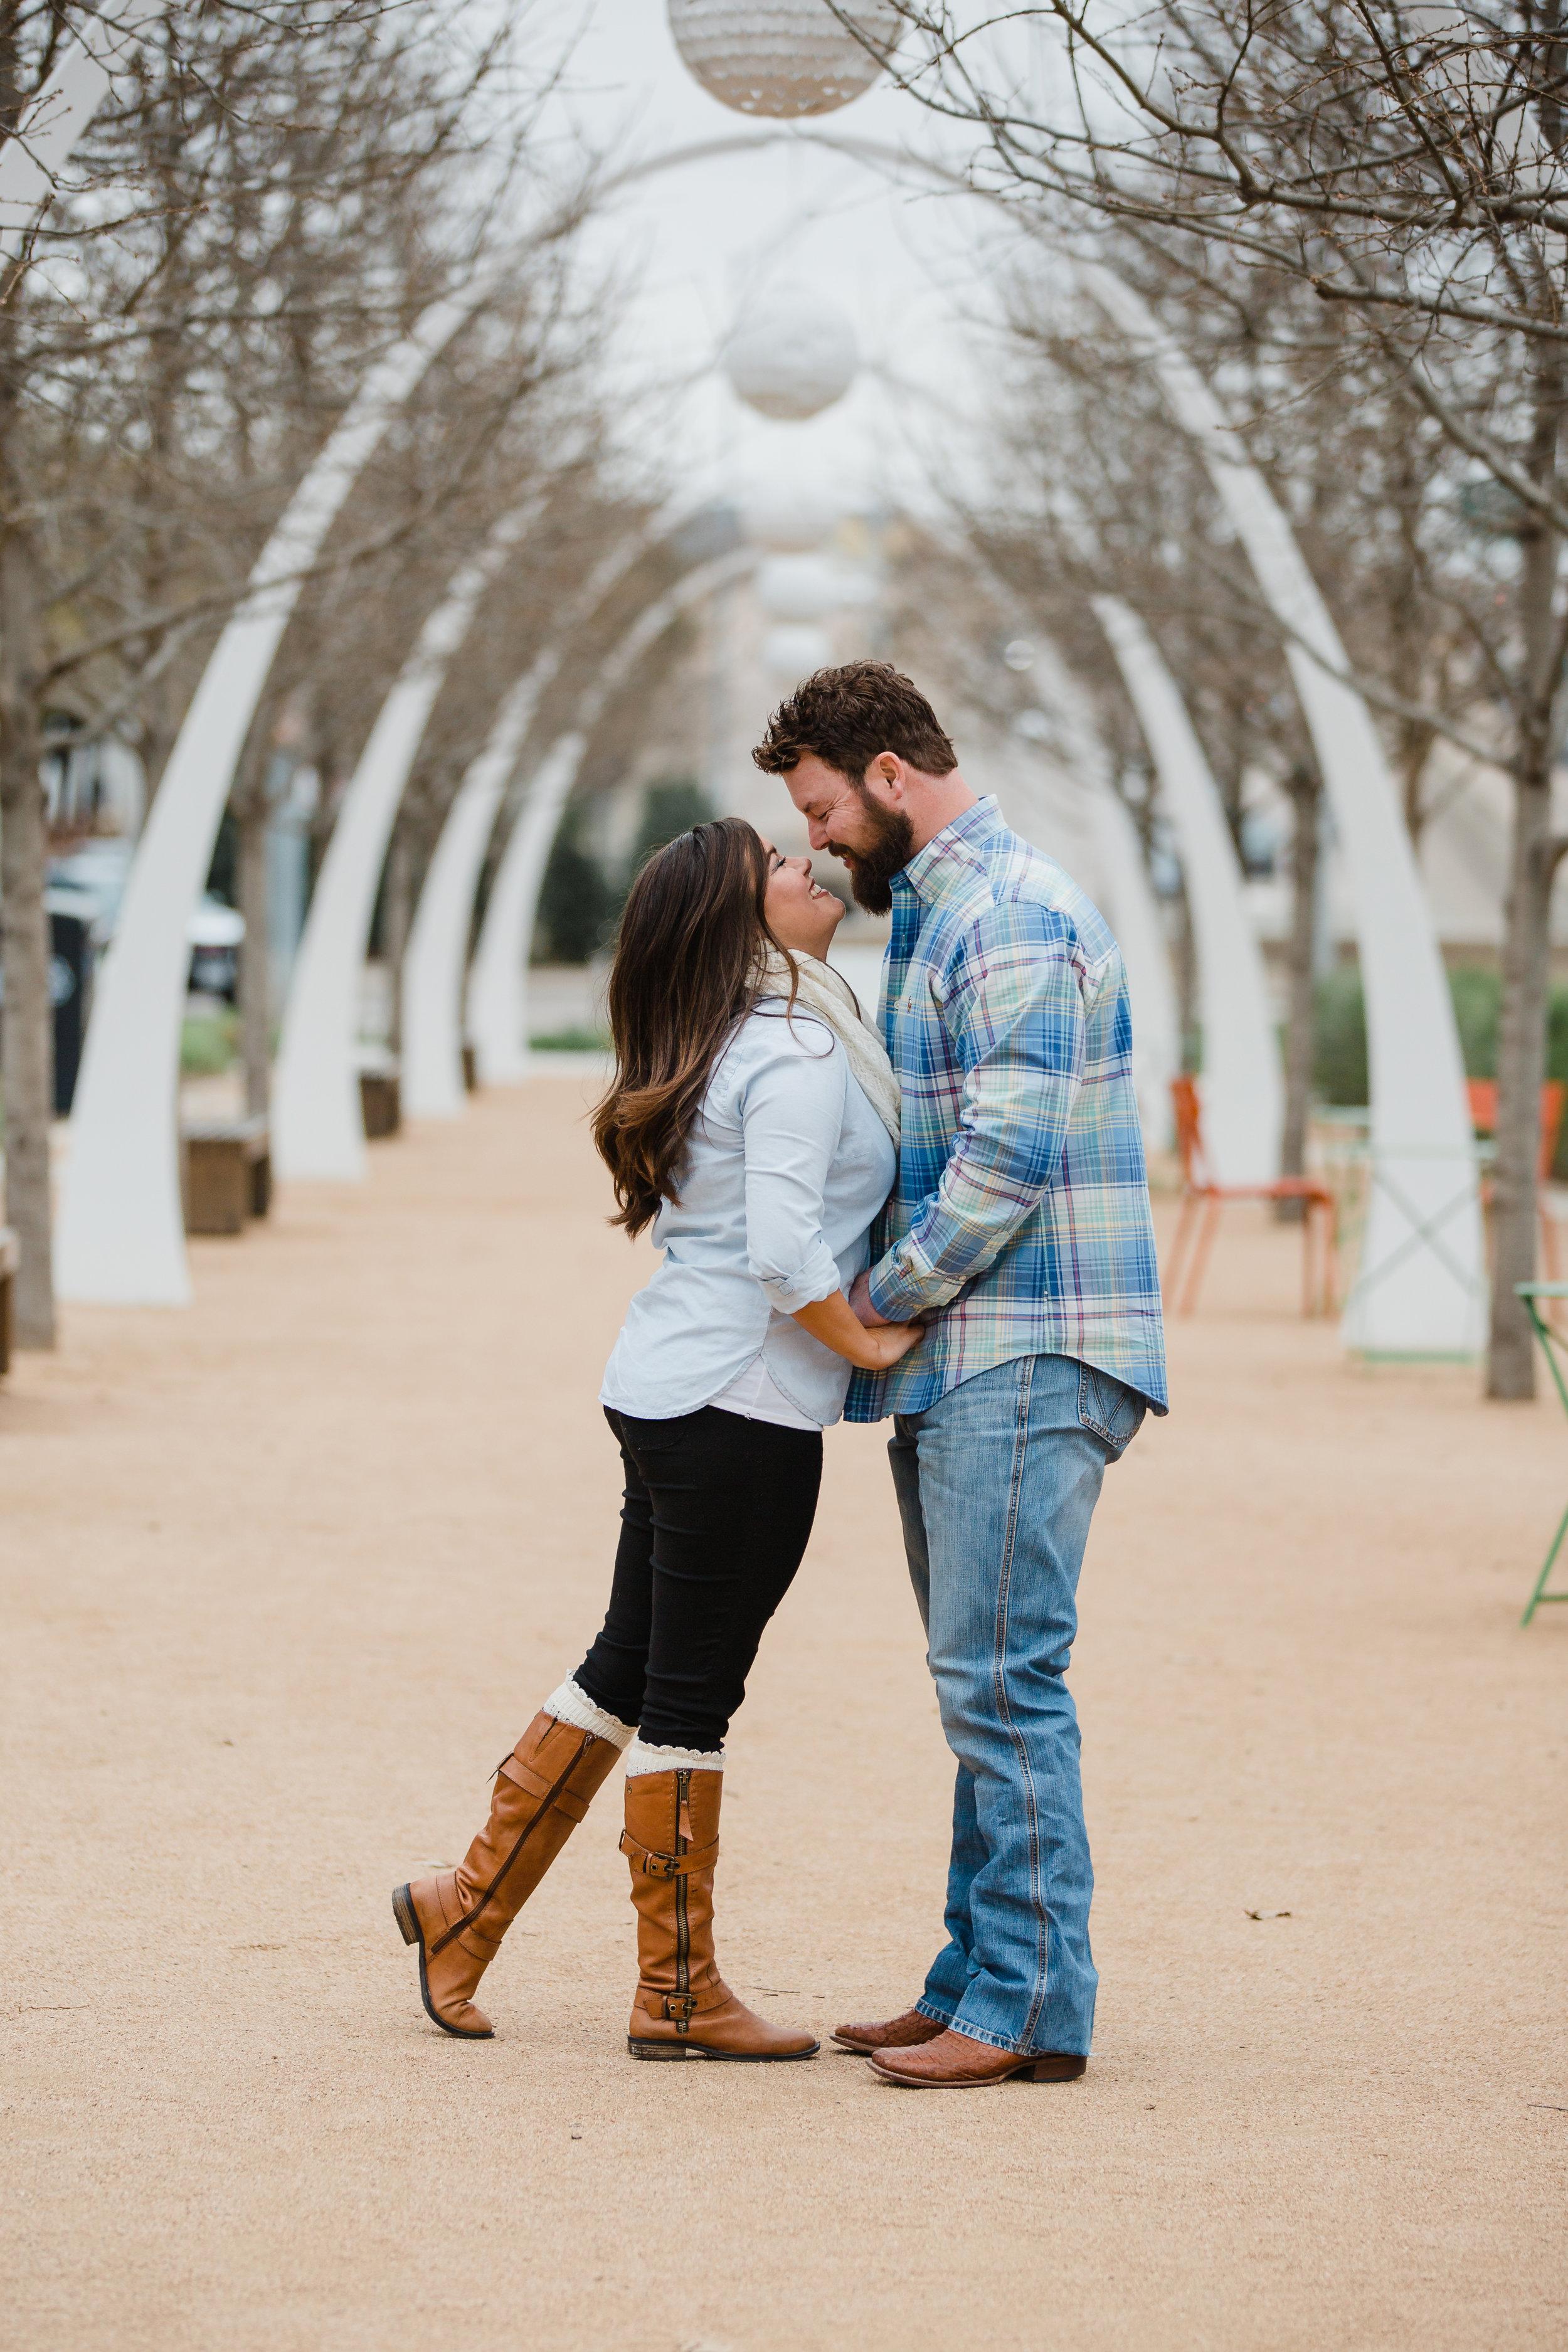 couples in love, dallas photographer, dallas fashion and lifestyle, dallas wedding style, chic bride, texas wedding photographer, best wedding photographer